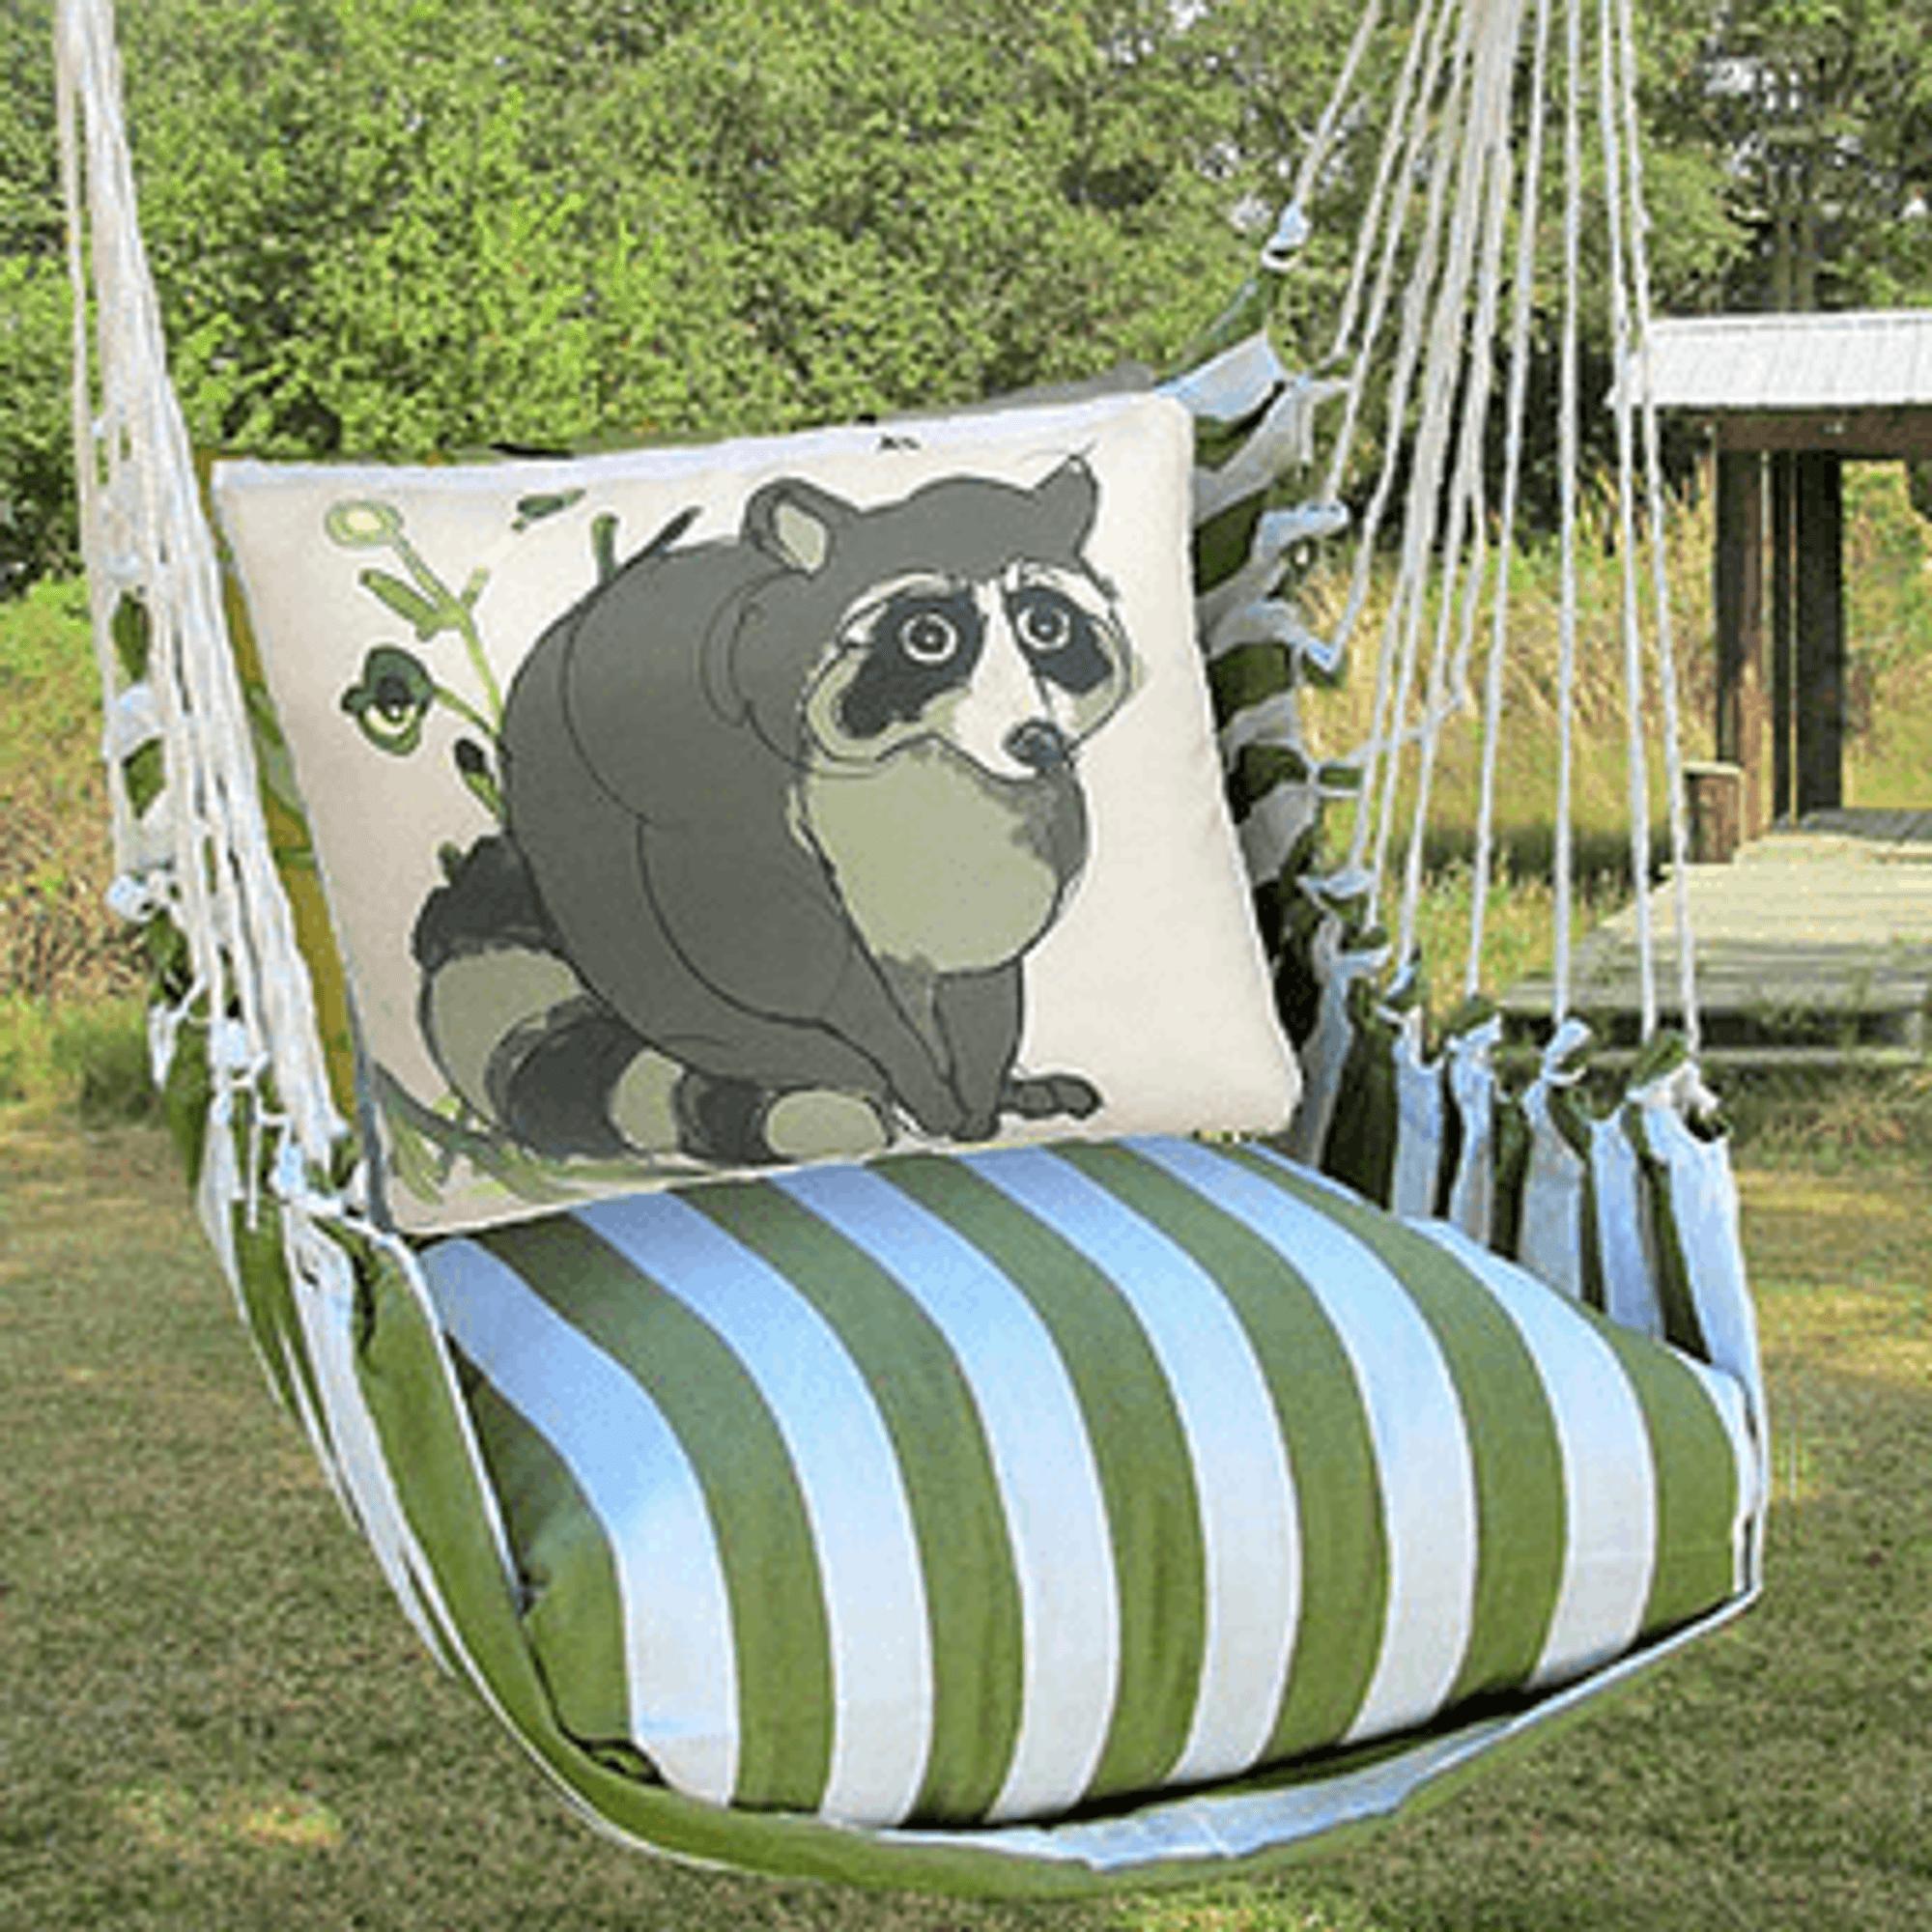 Raccoon Hammock Chair Swing Summer Palm Magnolia Casual